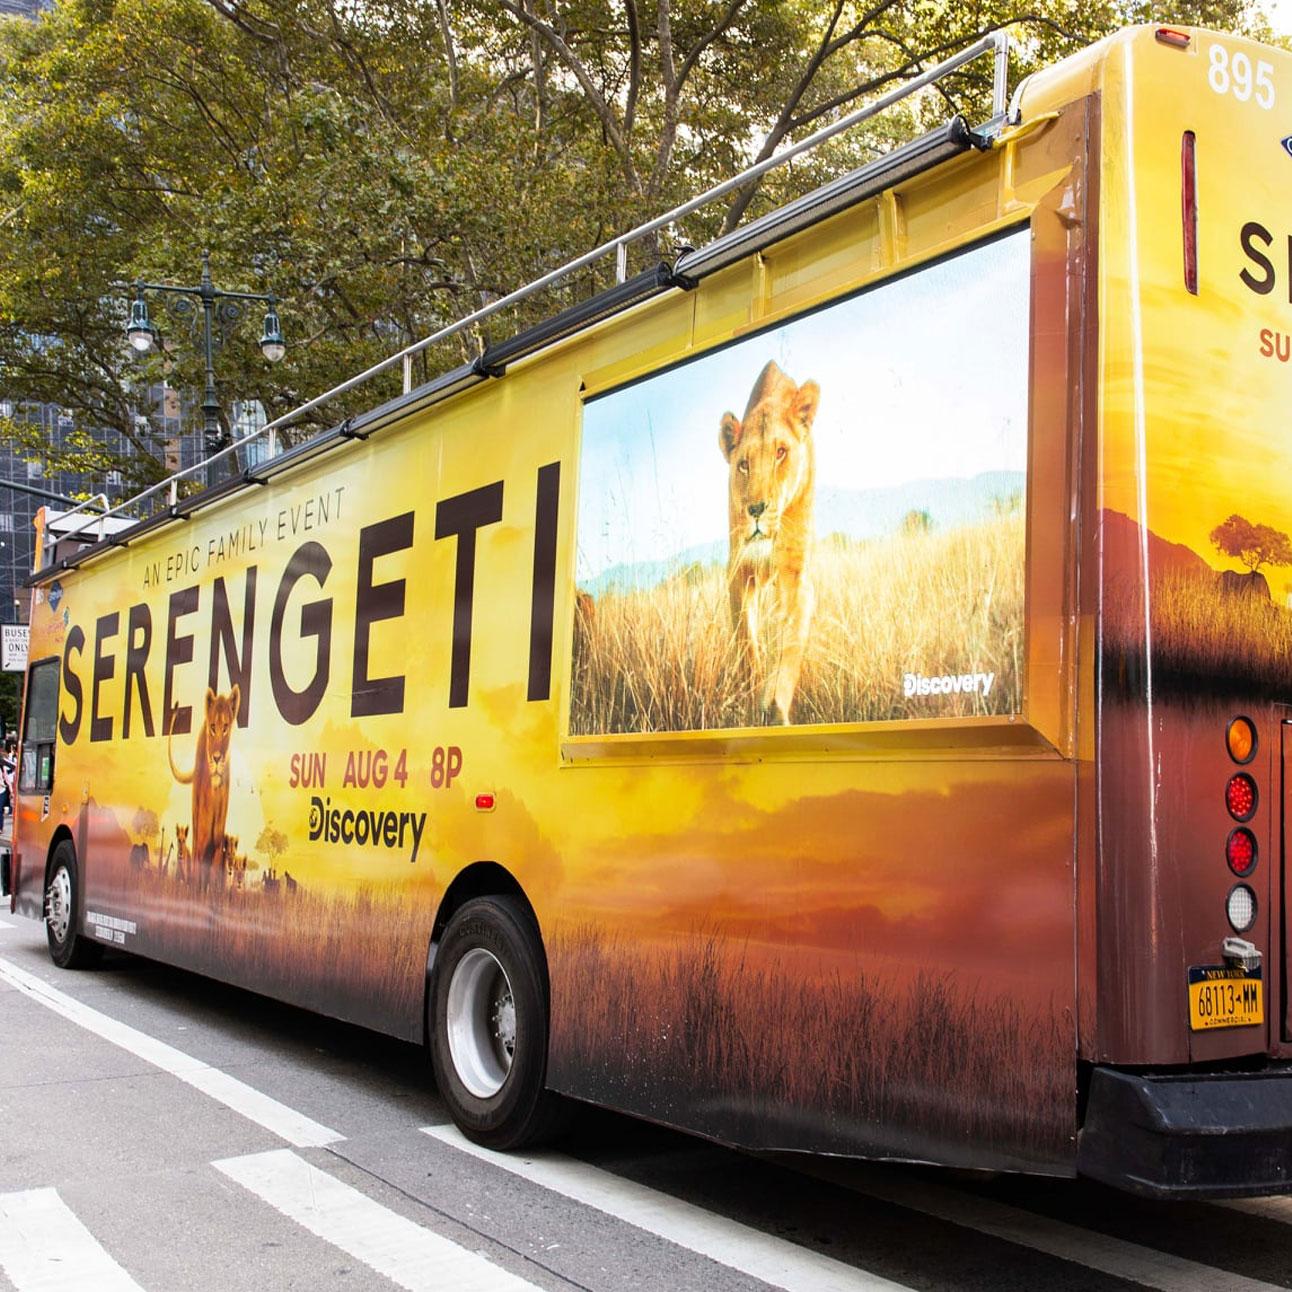 Serengeti bus in Midtown Manhattan NY